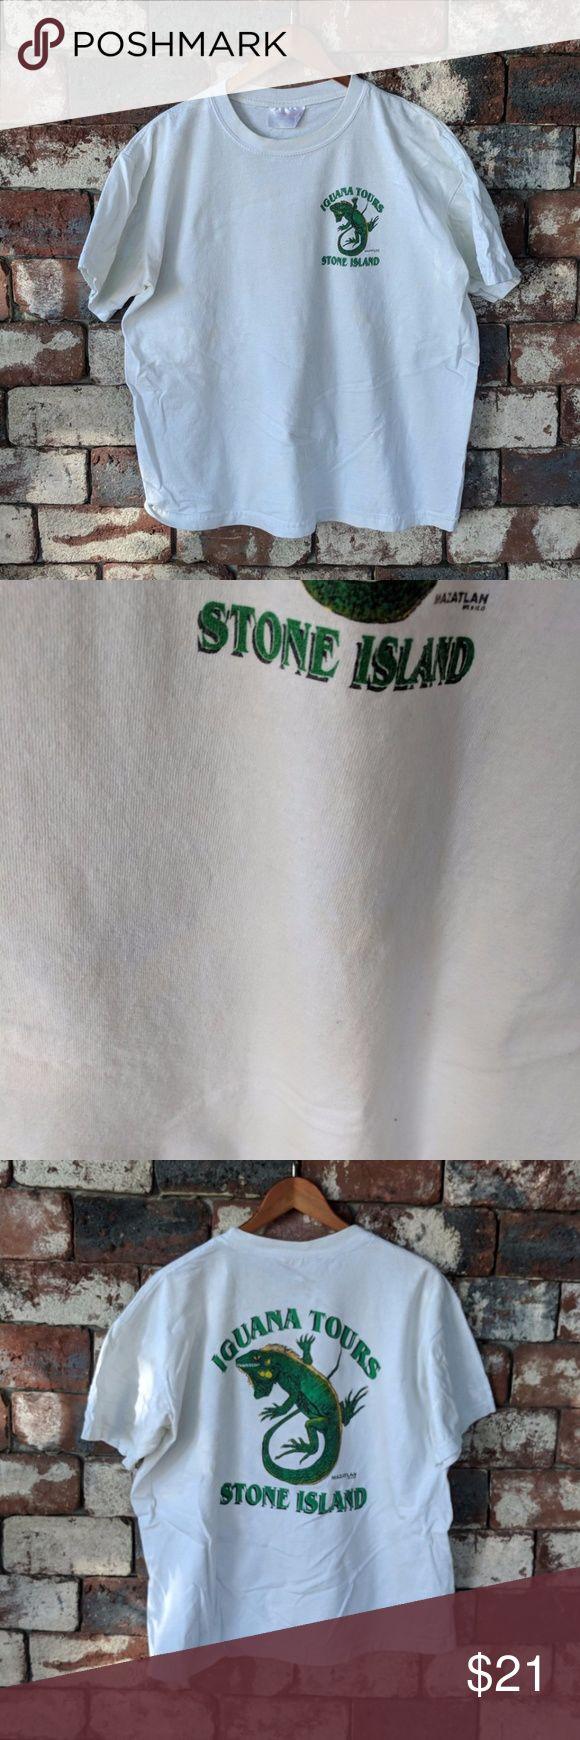 Vintage Mazatlan Stone island t-shirt Vintage Mazatlan Stone island t-shirt  Faded size tag reads XXL  Barely visible yellow spot (pic 2) 🍺🍺🍺   #mazatlan #mexico #stoneisland #beer #iguanatours #beer #cerveza #springbreak #vintage #90s Shirts Tees - Short Sleeve